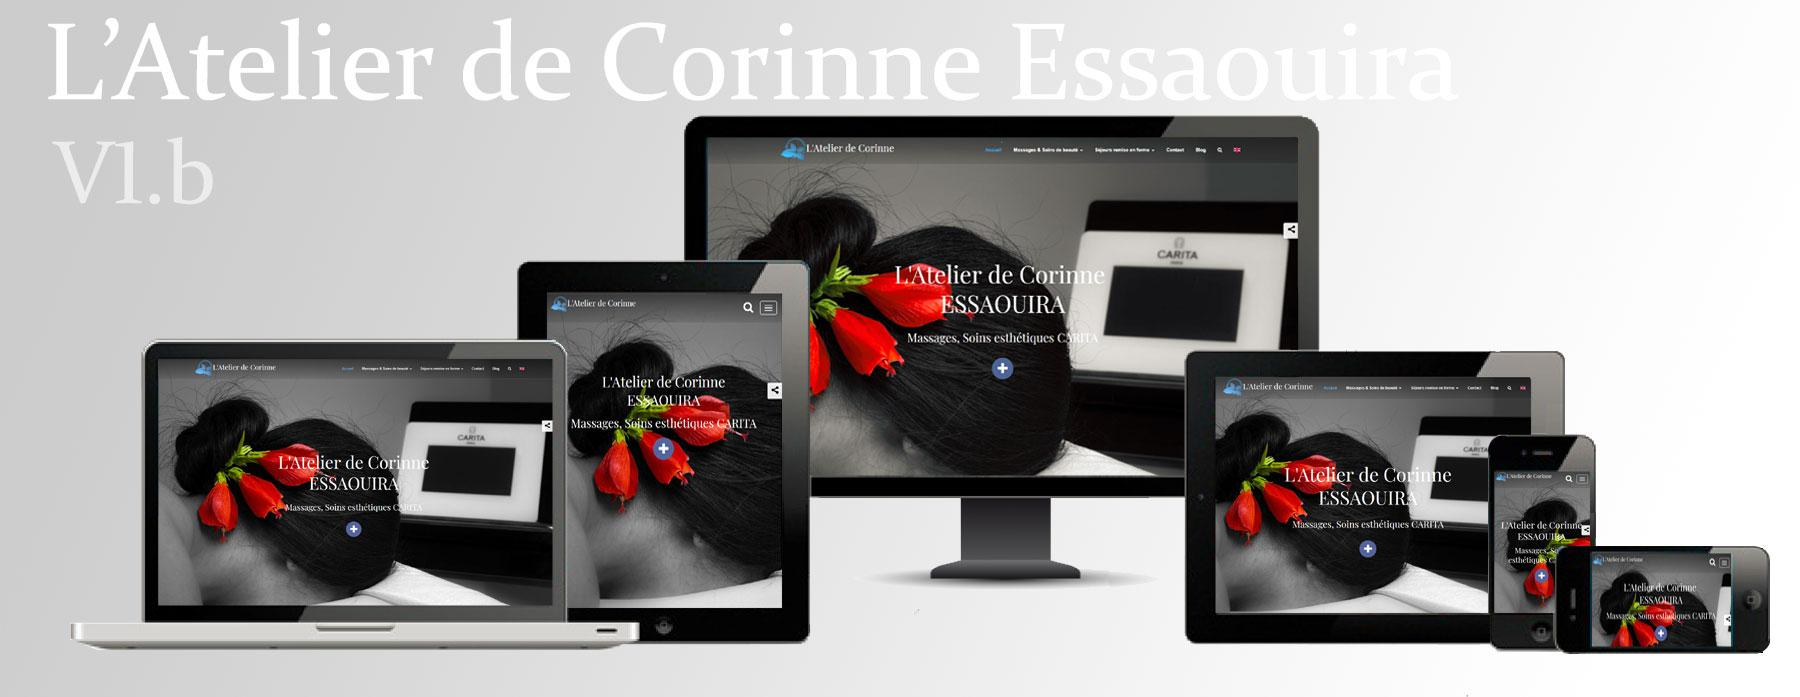 L'Atelier de Corinne